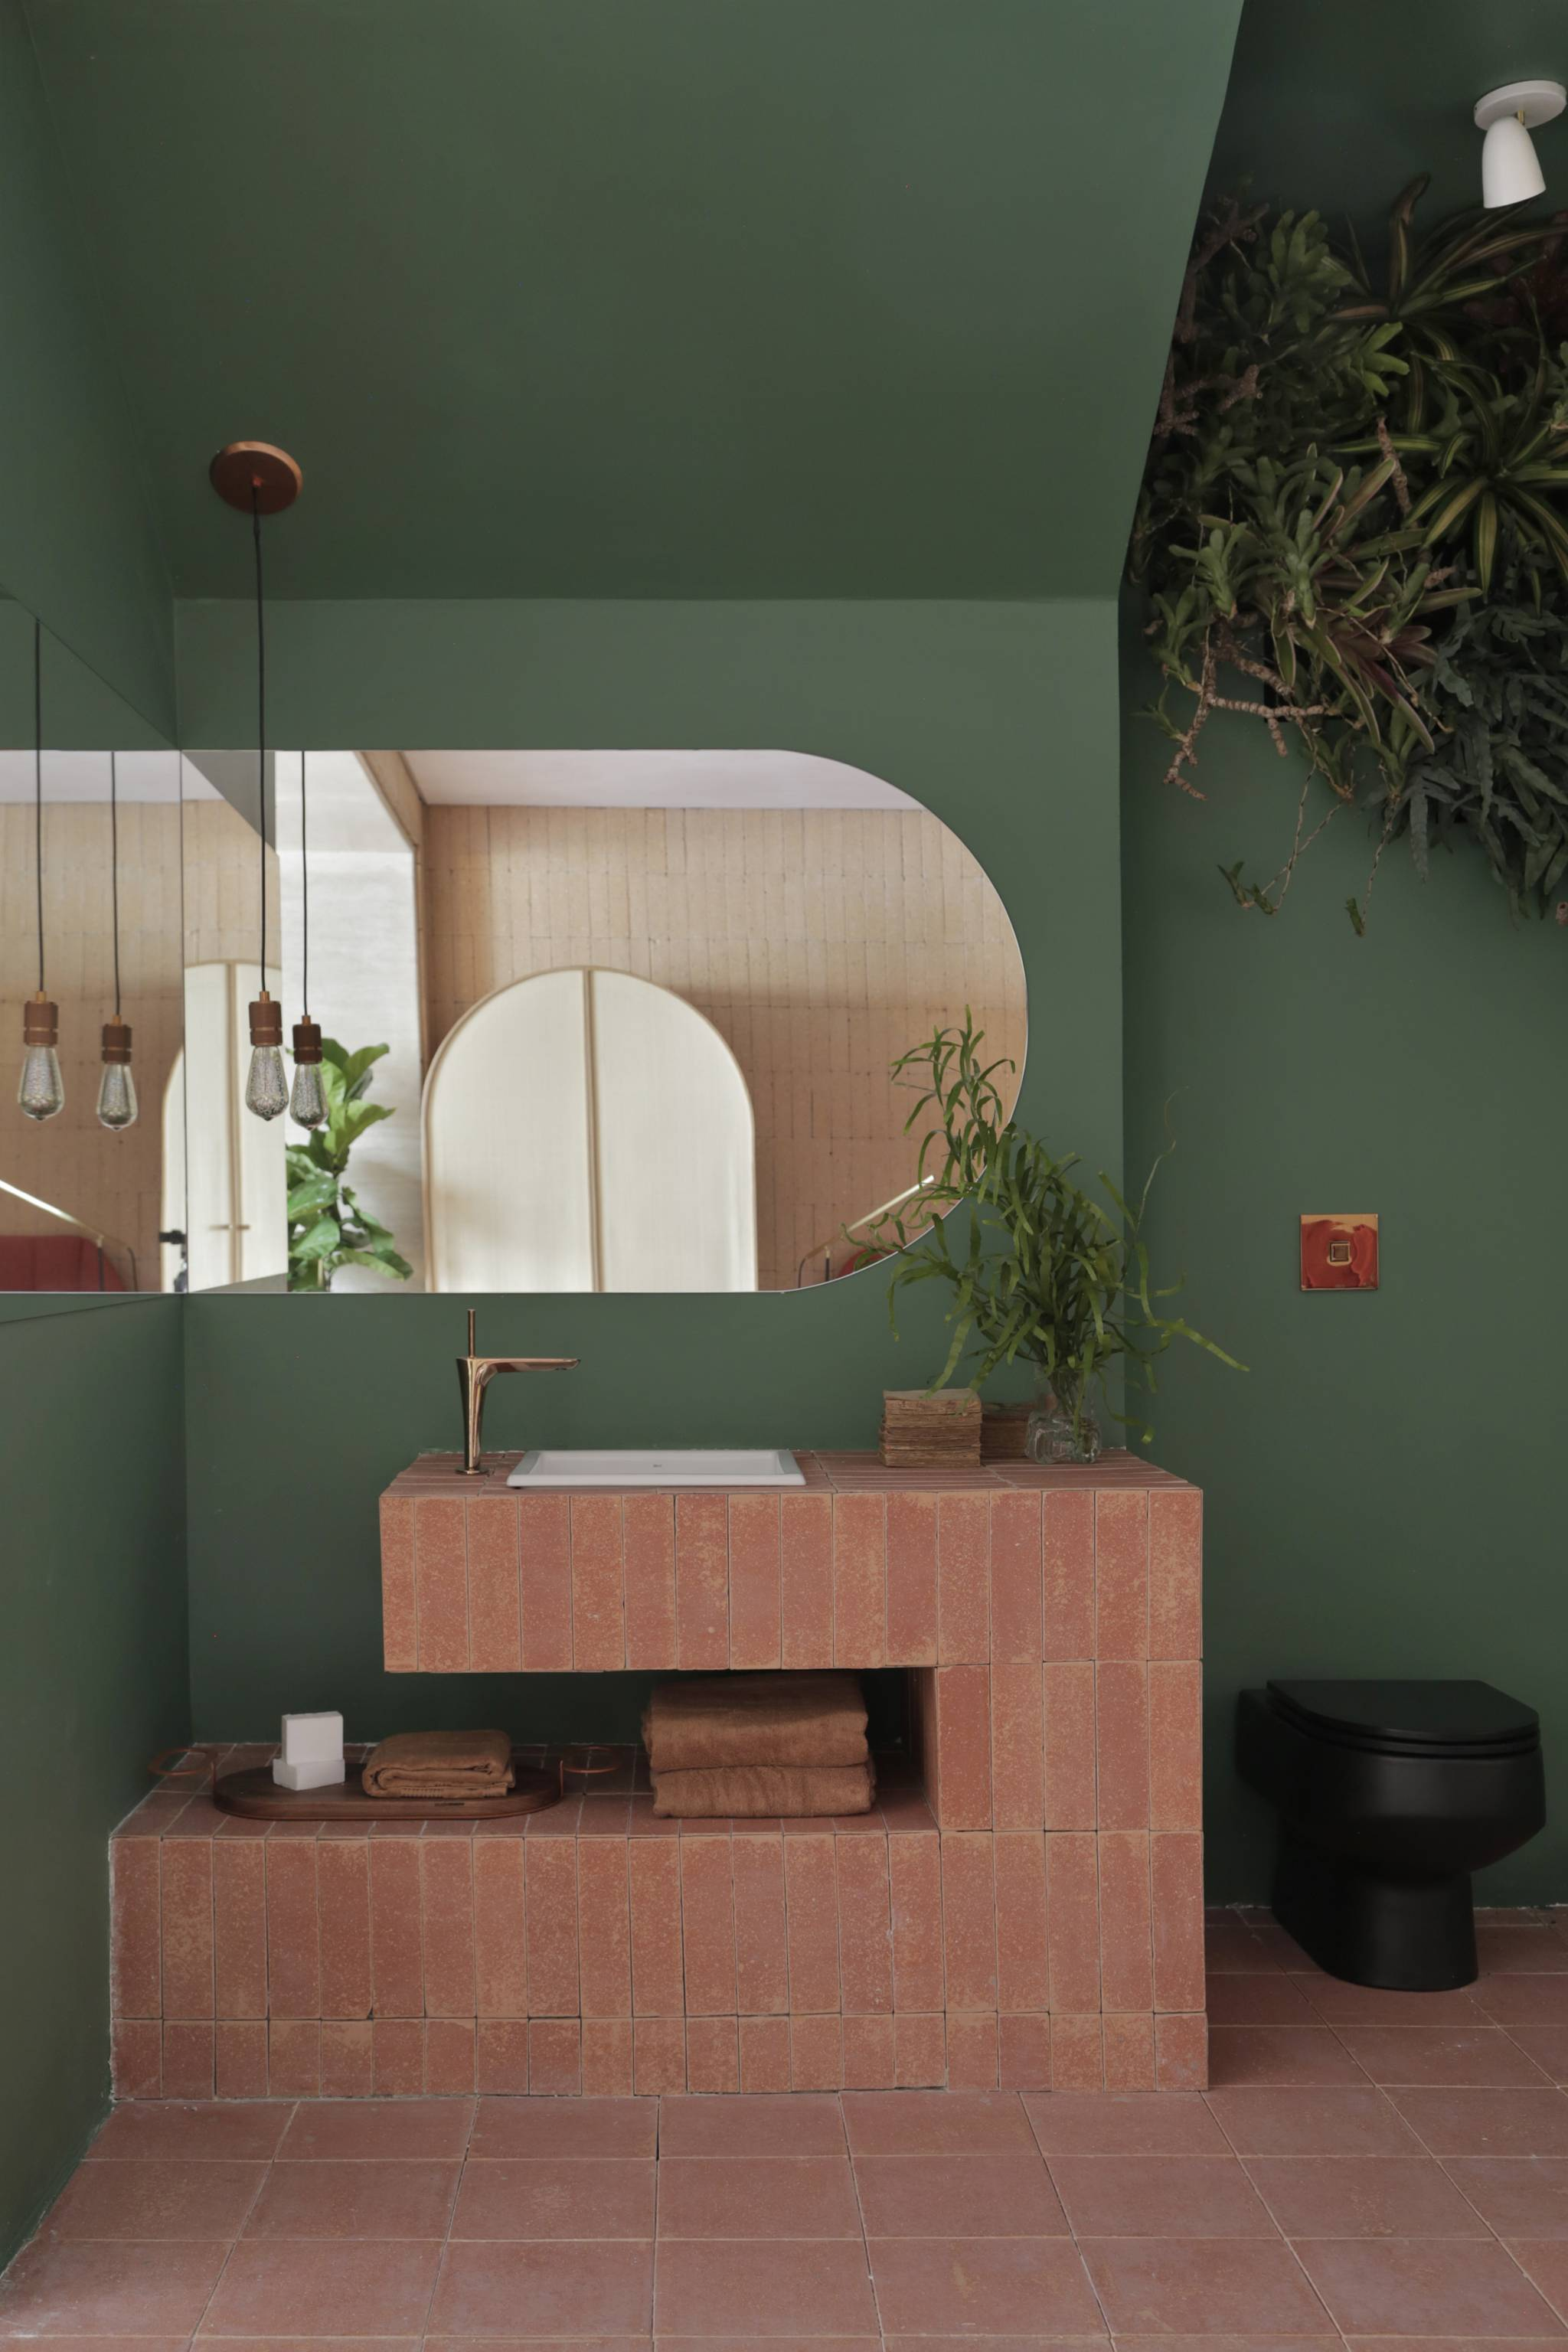 Studio Hygge by Melina Romano / via @kronekern